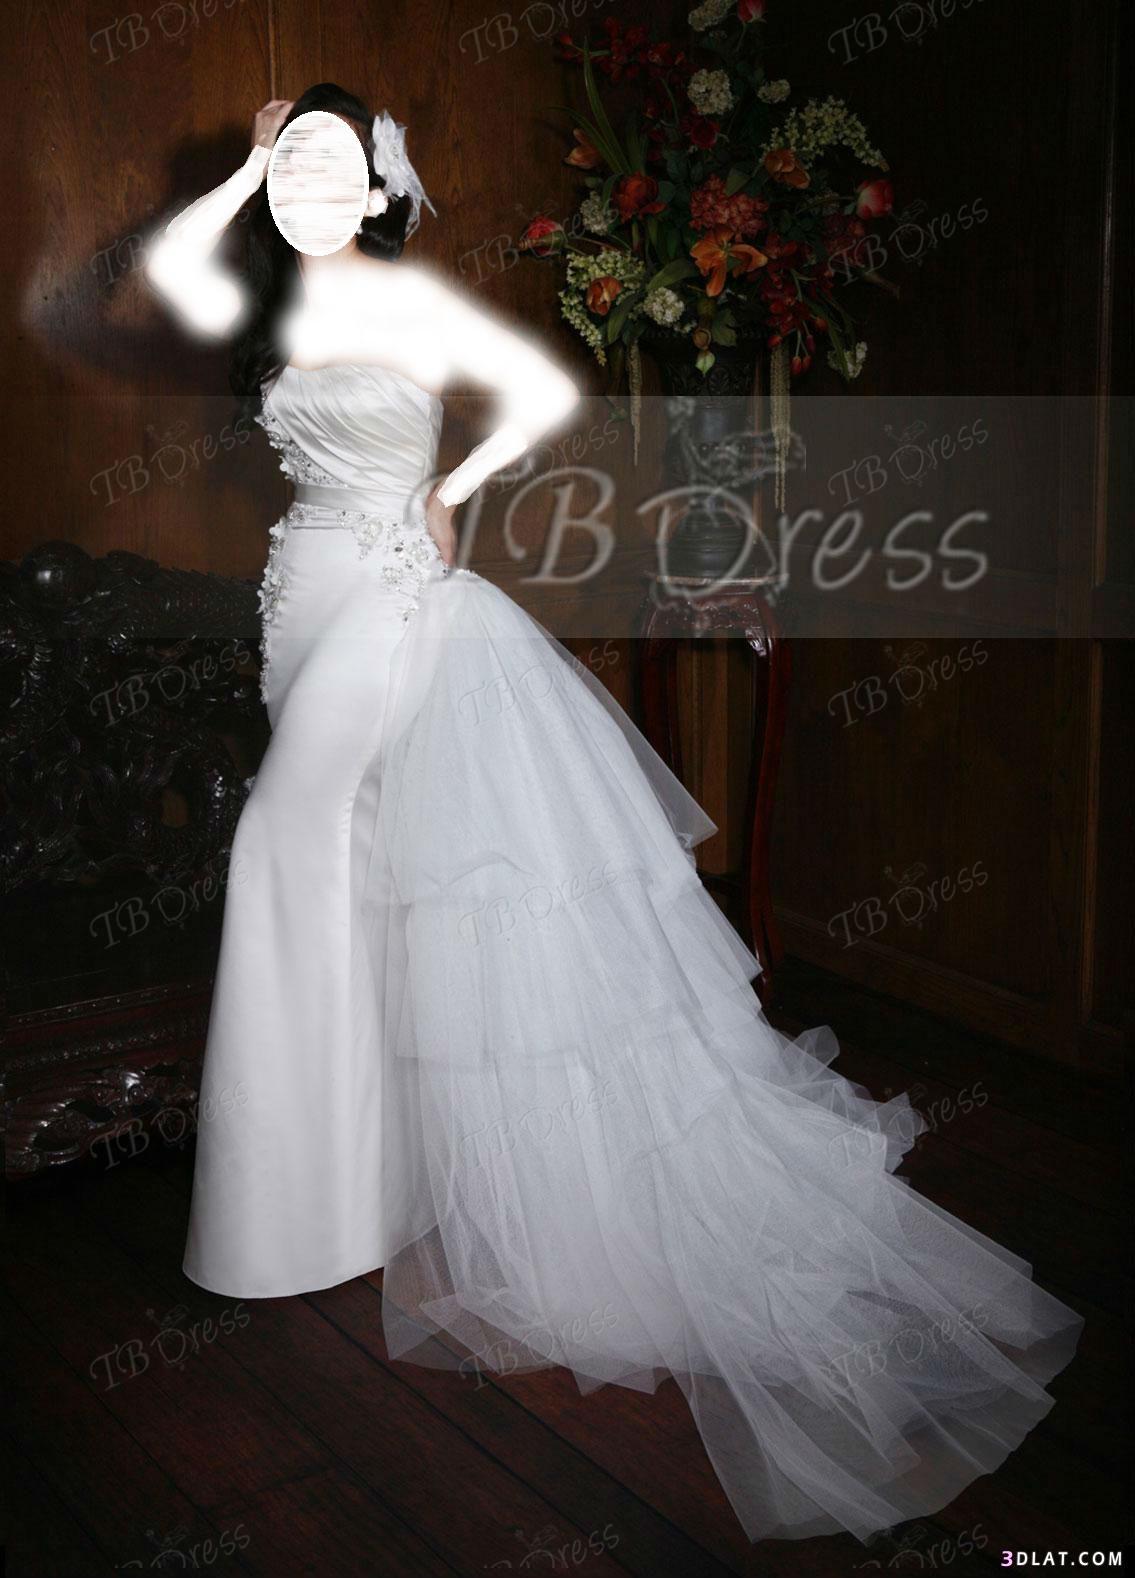 فساتين عروس - فساتين للزفاف - فساتين فرح جميلة